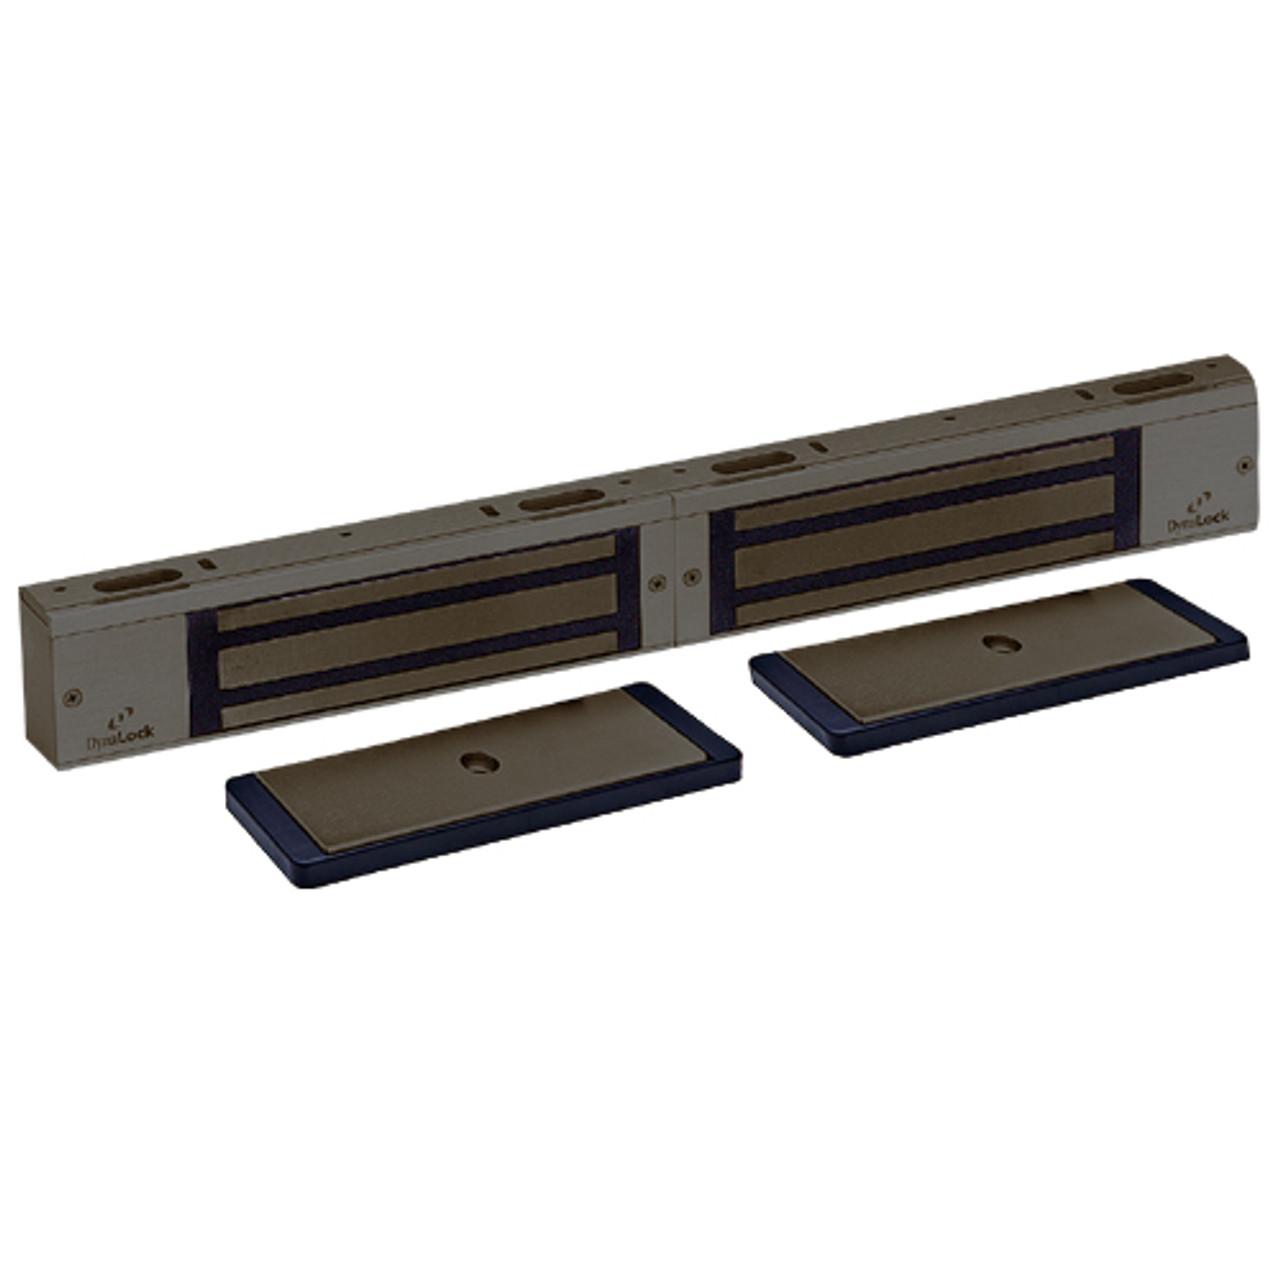 3002TJ32-US10B DynaLock 3000 Series 1500 LBs Double Electromagnetic Lock for Inswing Door in Oil Rubbed Bronze